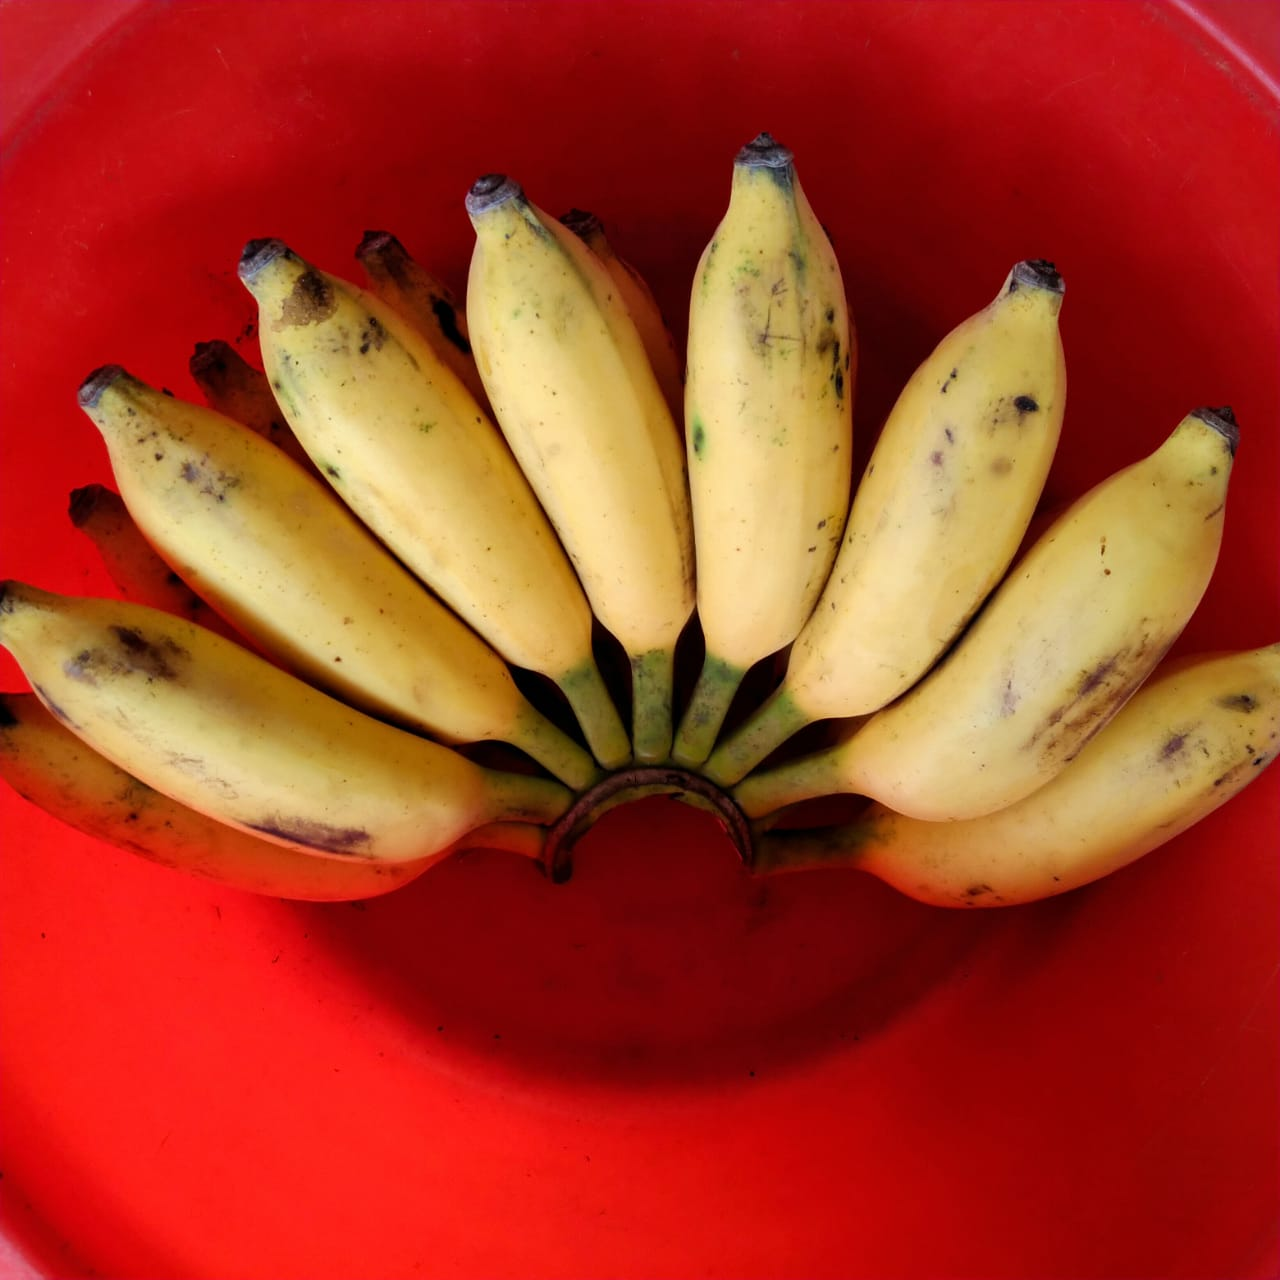 Bananas (Elaichi) per Kg